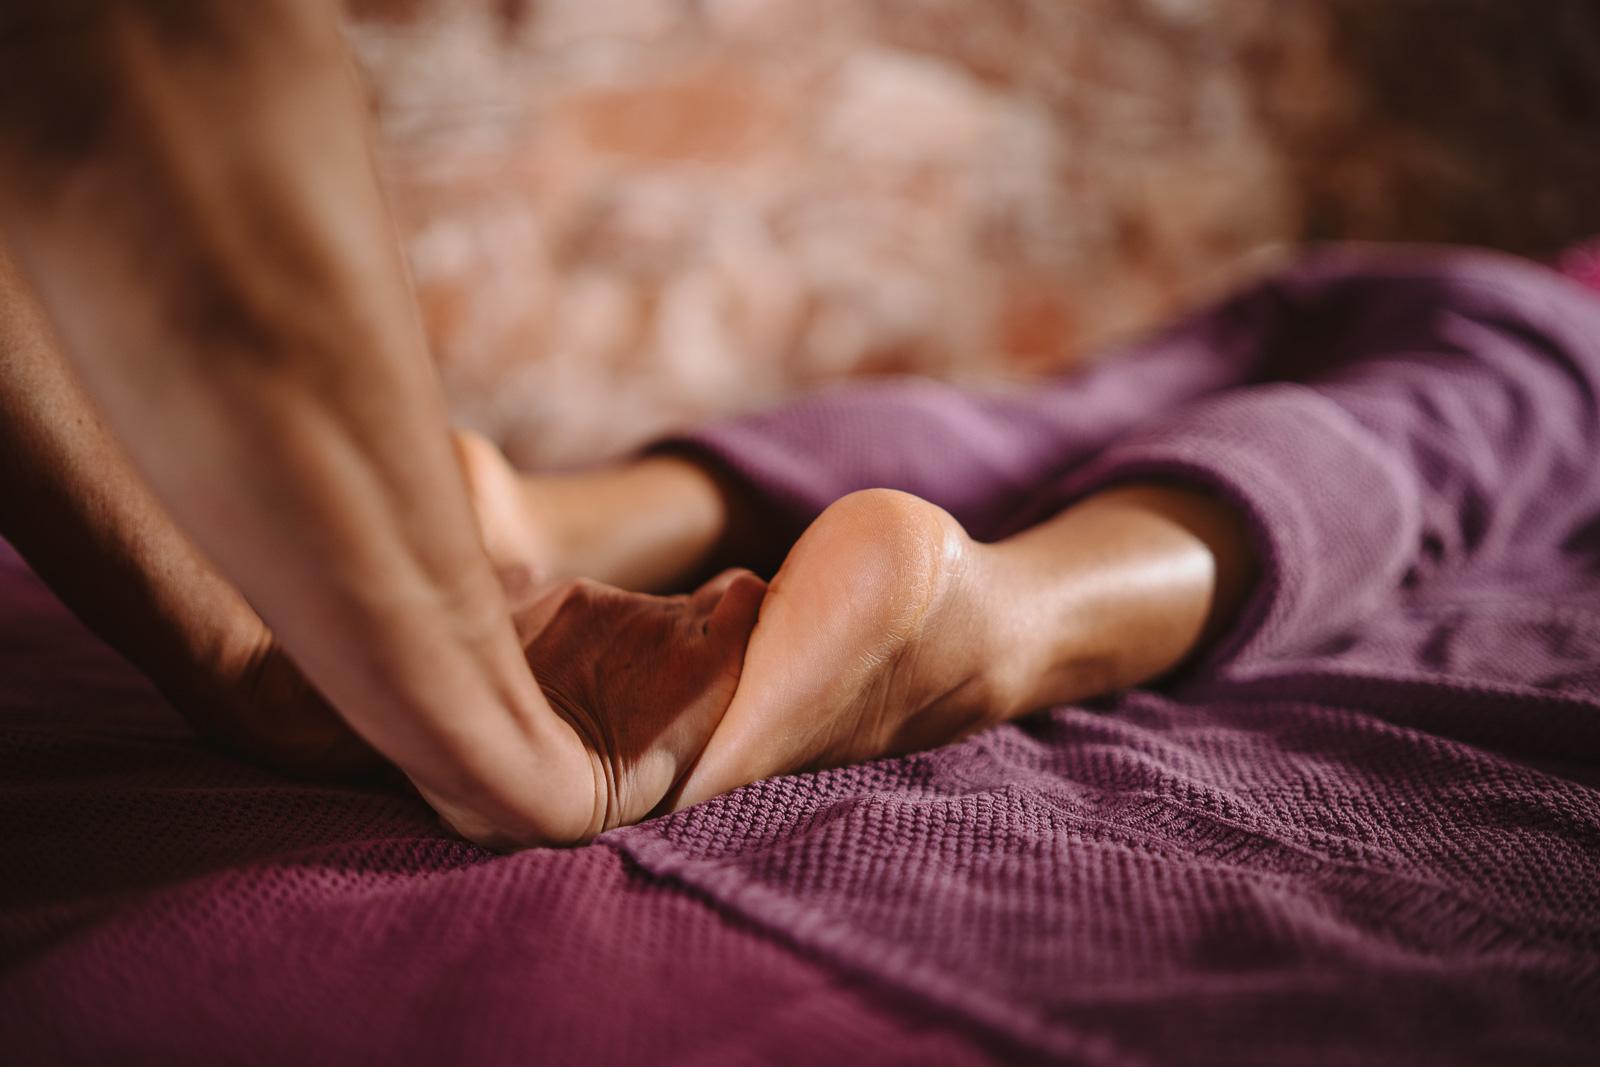 Unternehmensreportage - Salzgrotte Beuel Vital - Fußmassage